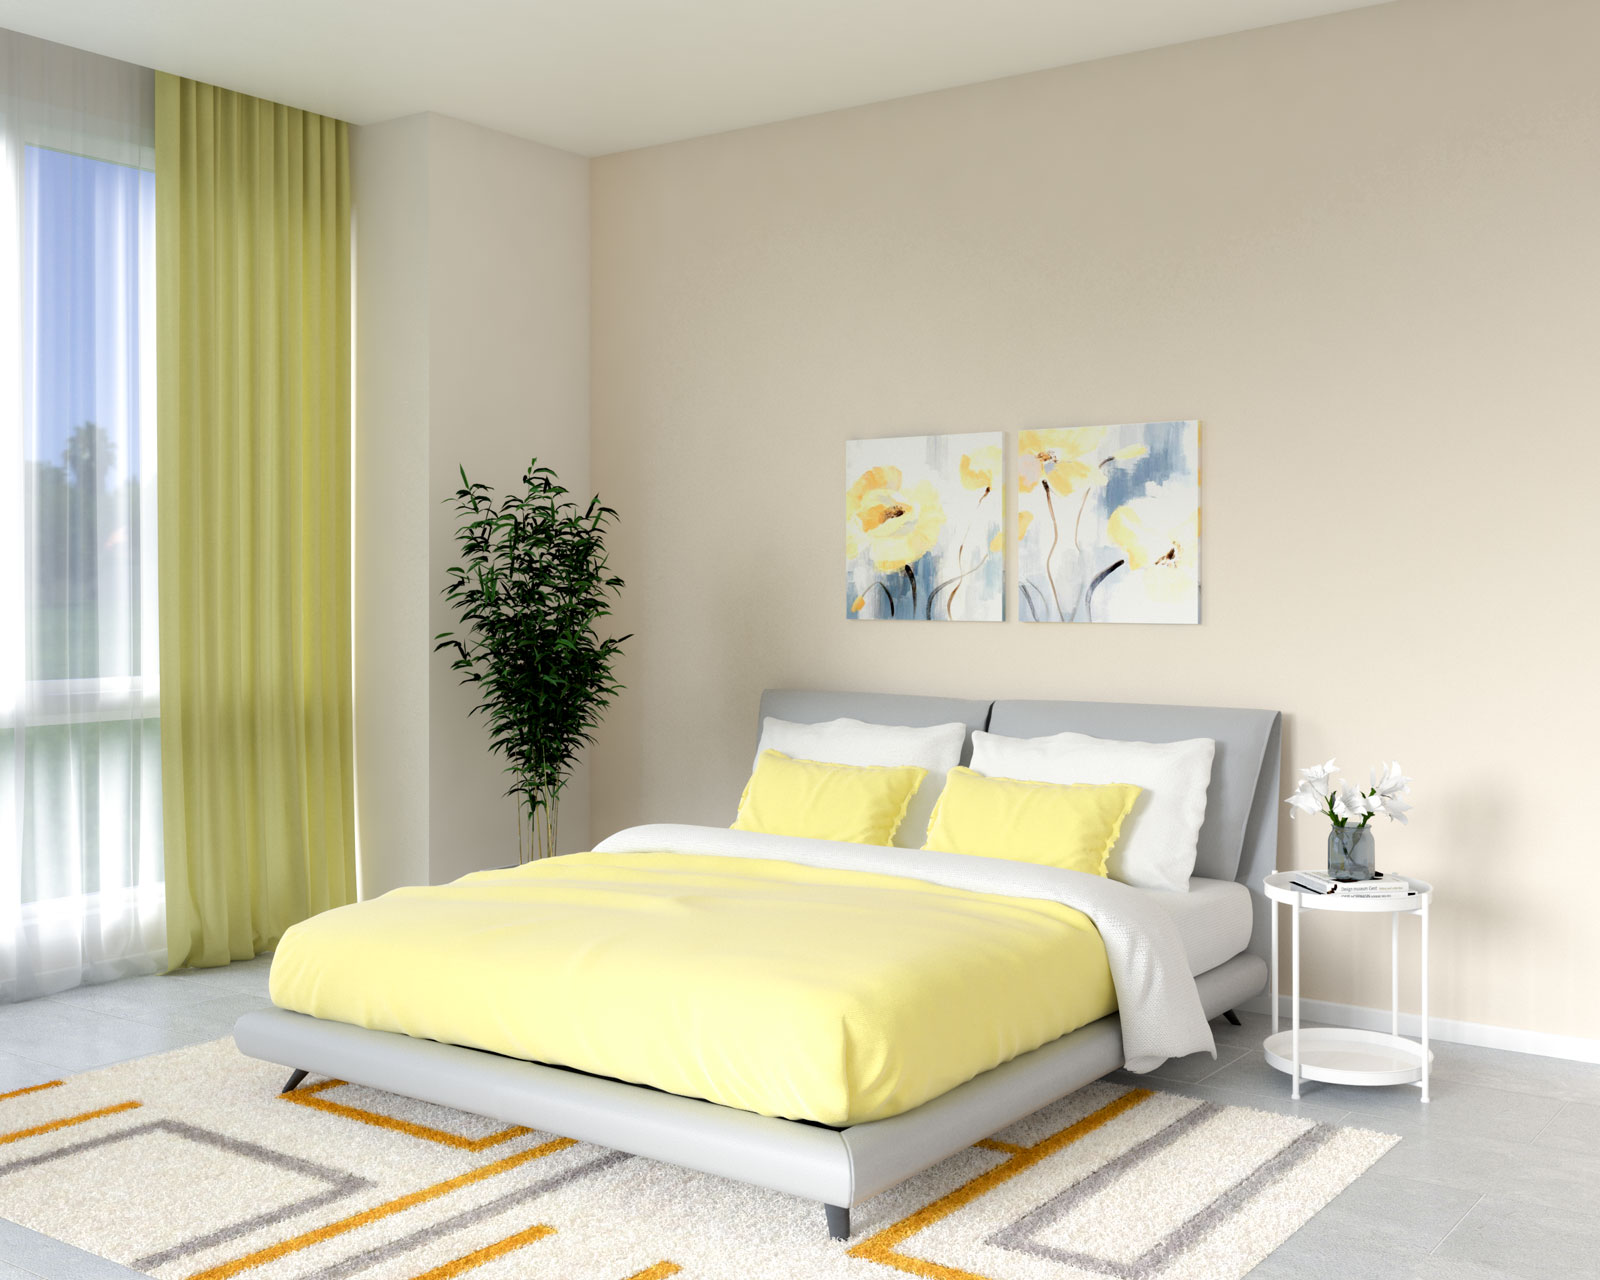 Beige and yellow bedroom ideas